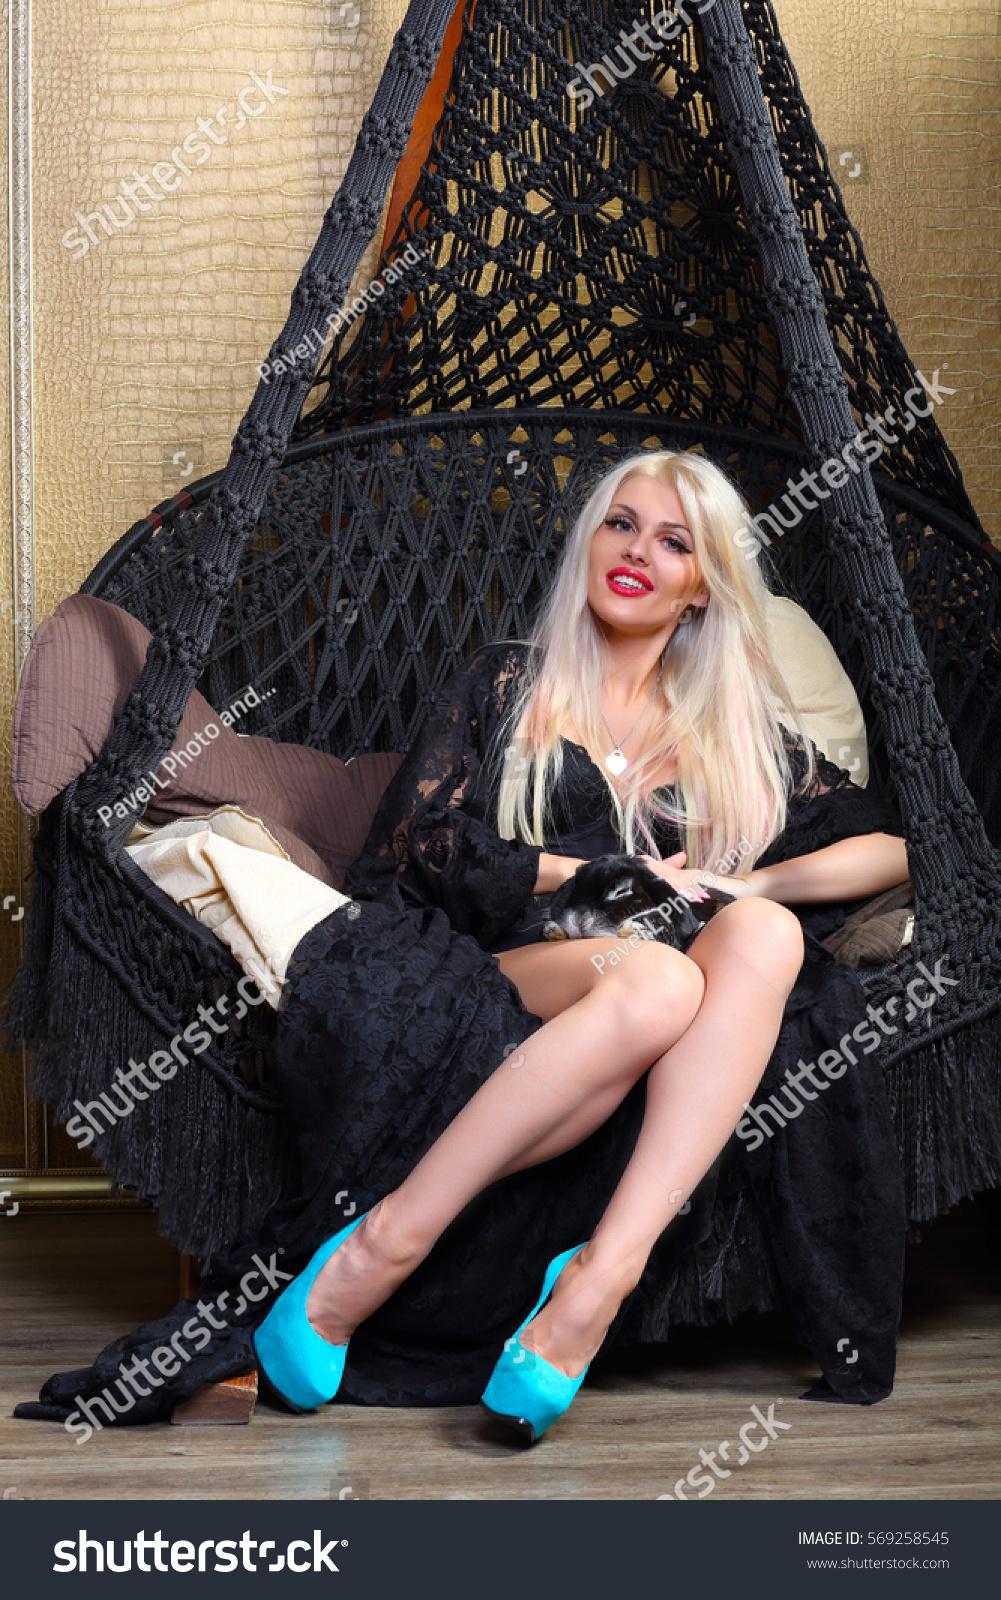 Blonde Black Poses Funny Rabbit On Stock Photo (Edit Now) 569258545 ...